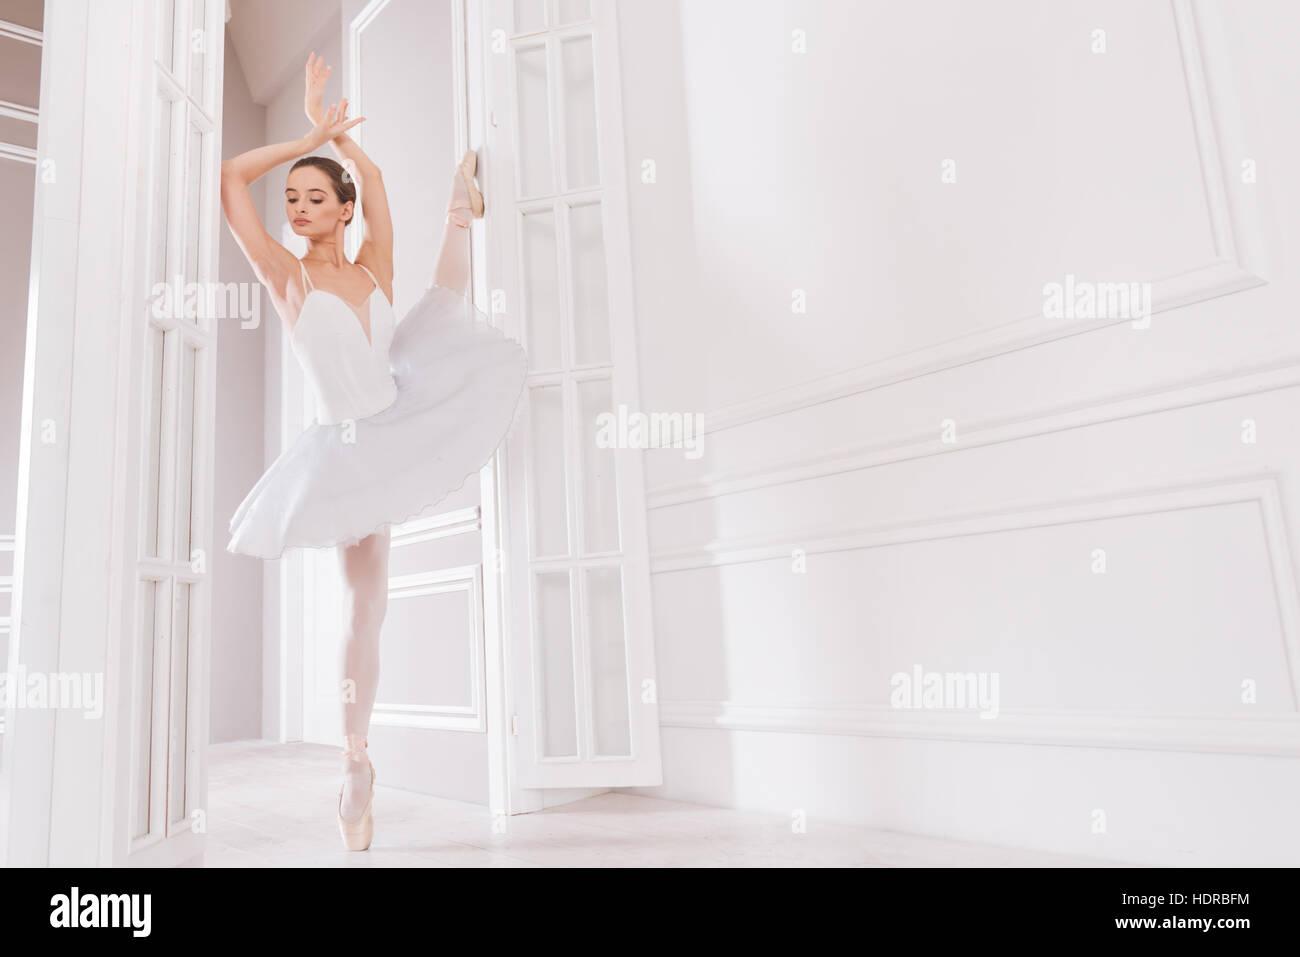 Tender ballet dancer looking aside - Stock Image